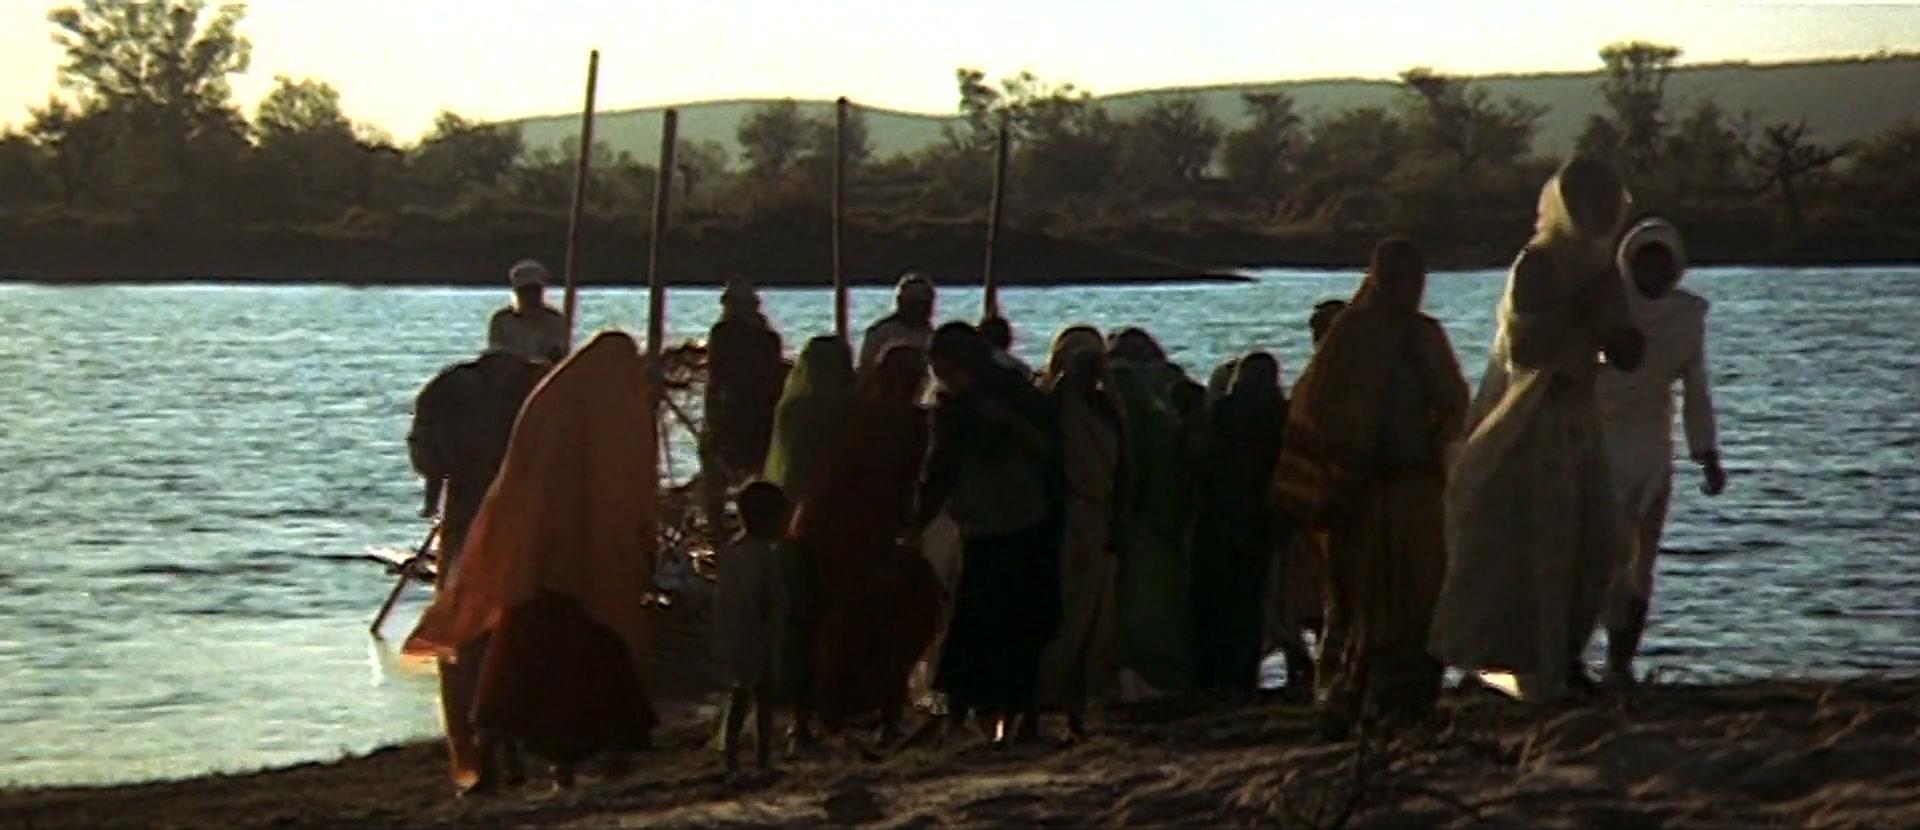 Siddhartha (1972) 1080p DVDRip AVC AC3-TMB 18+